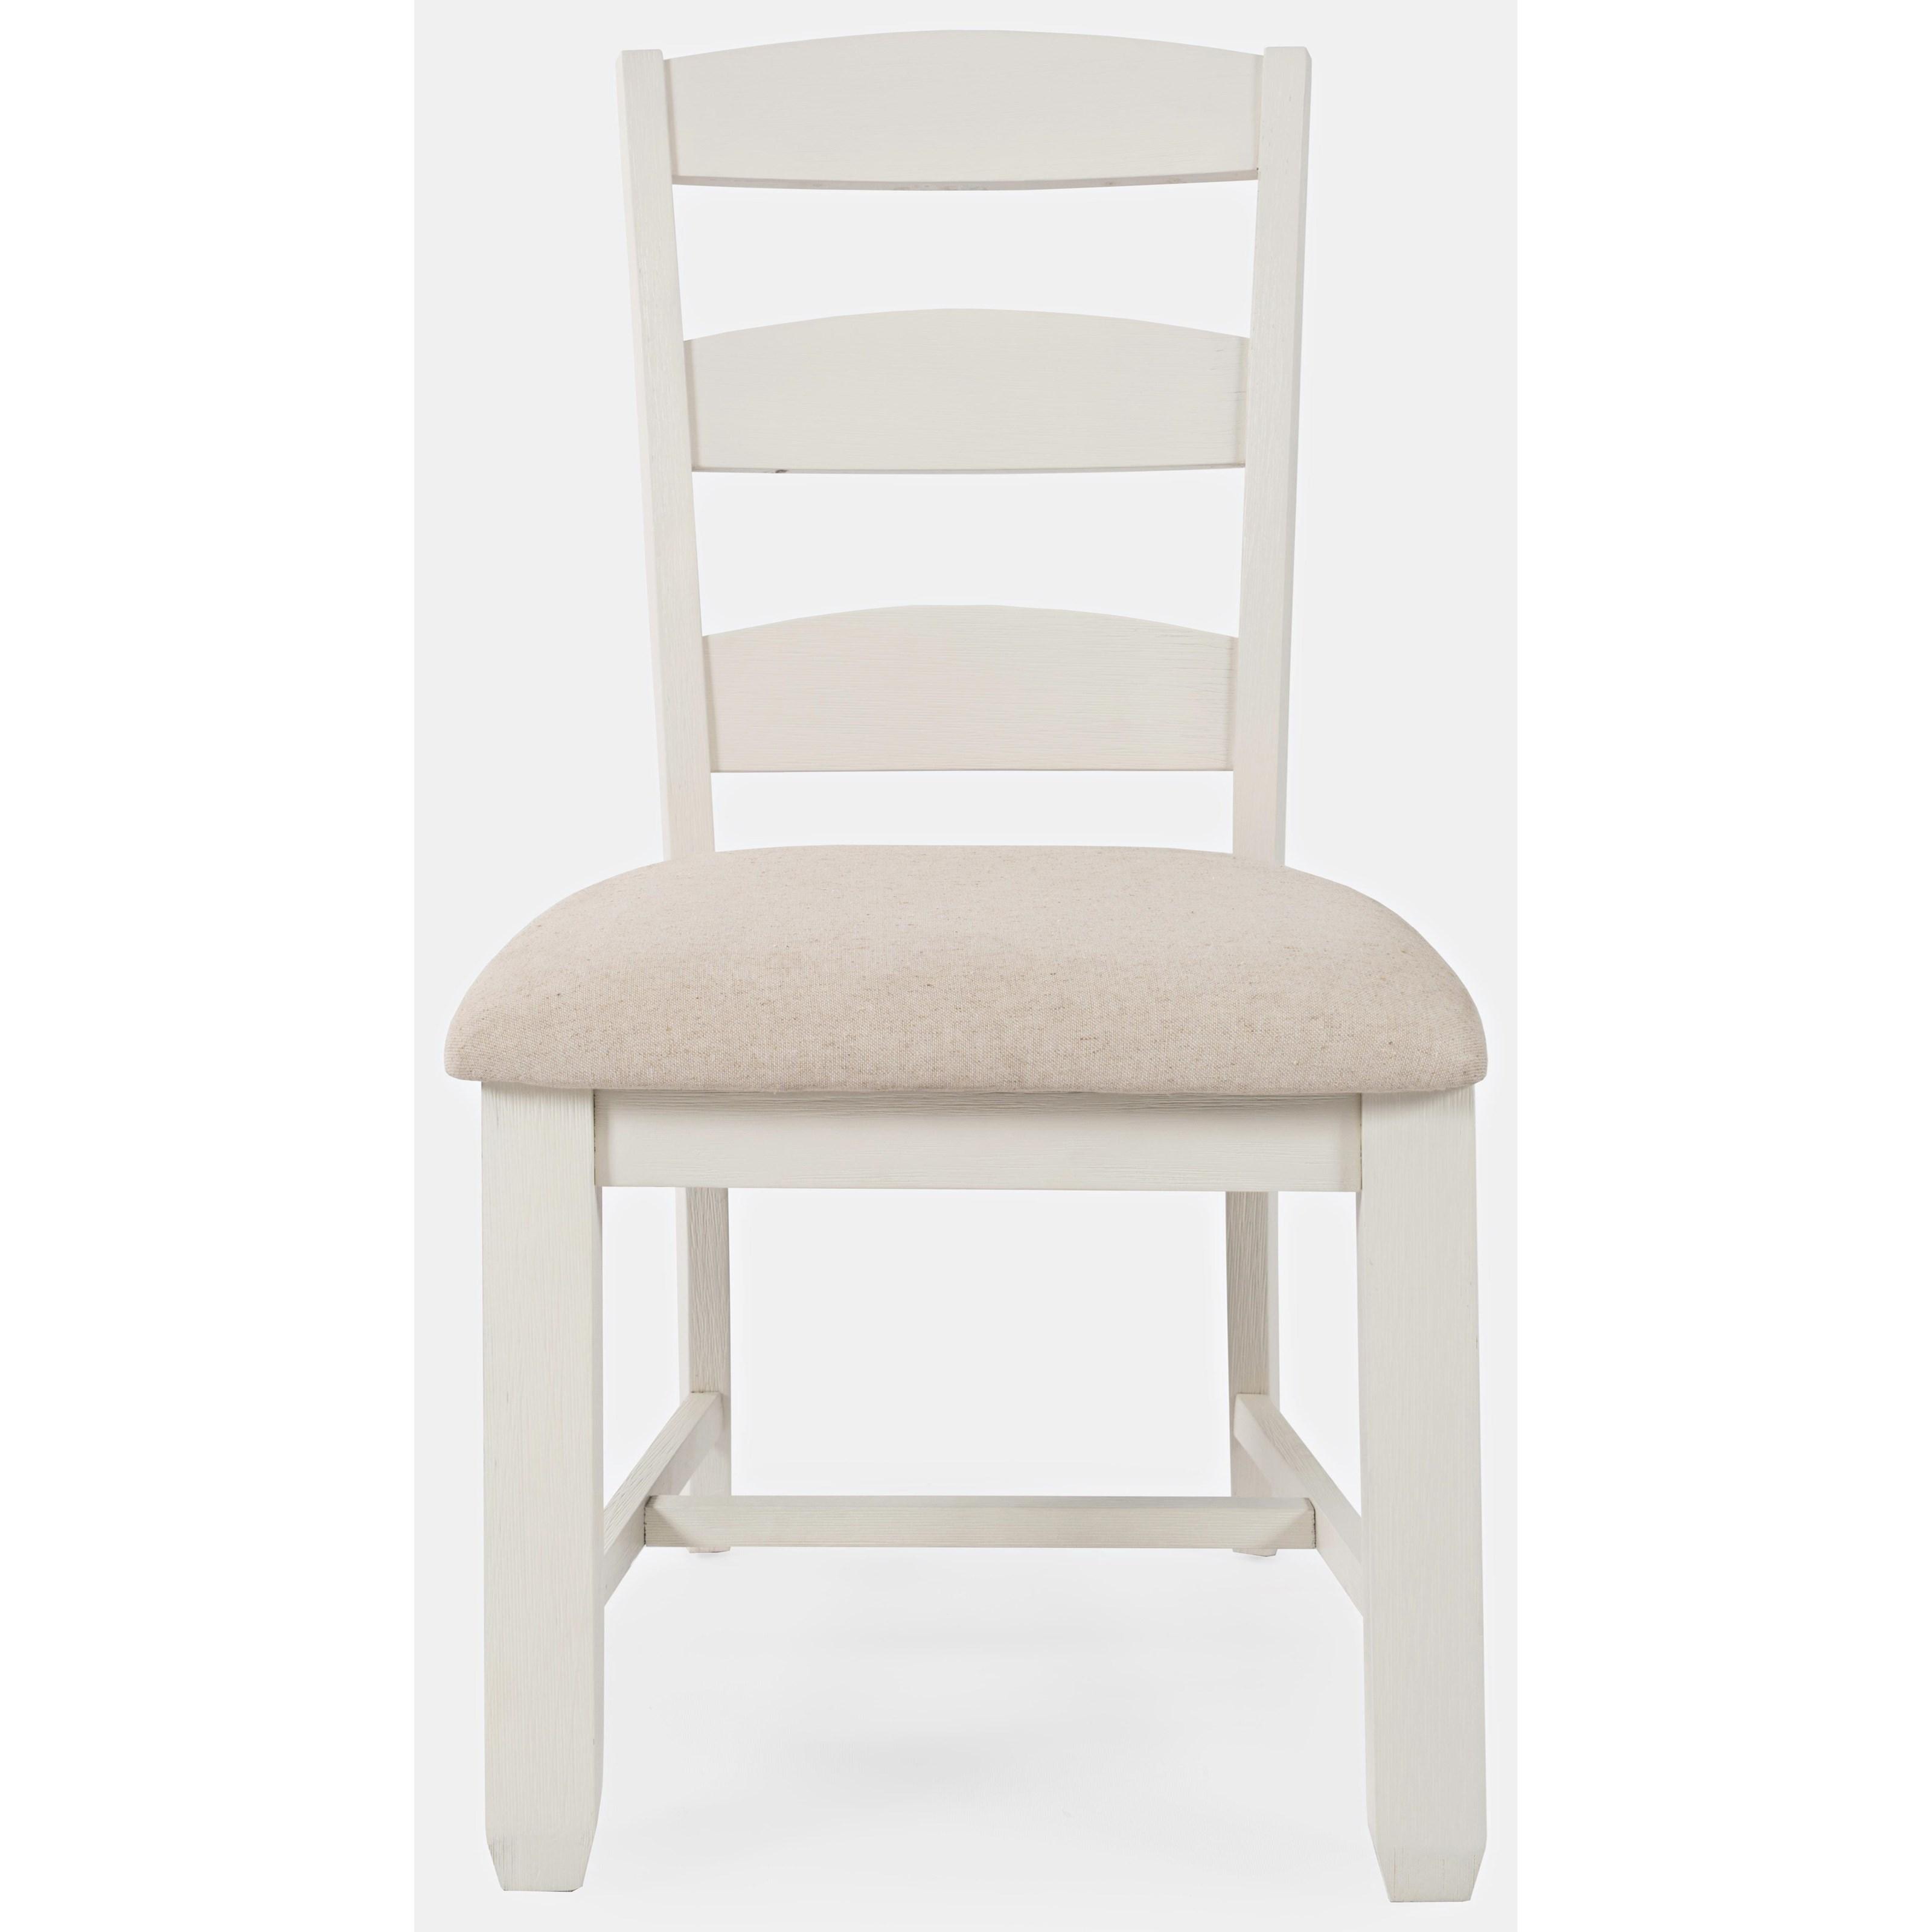 Dana Point Ladderback Chair by Jofran at Jofran